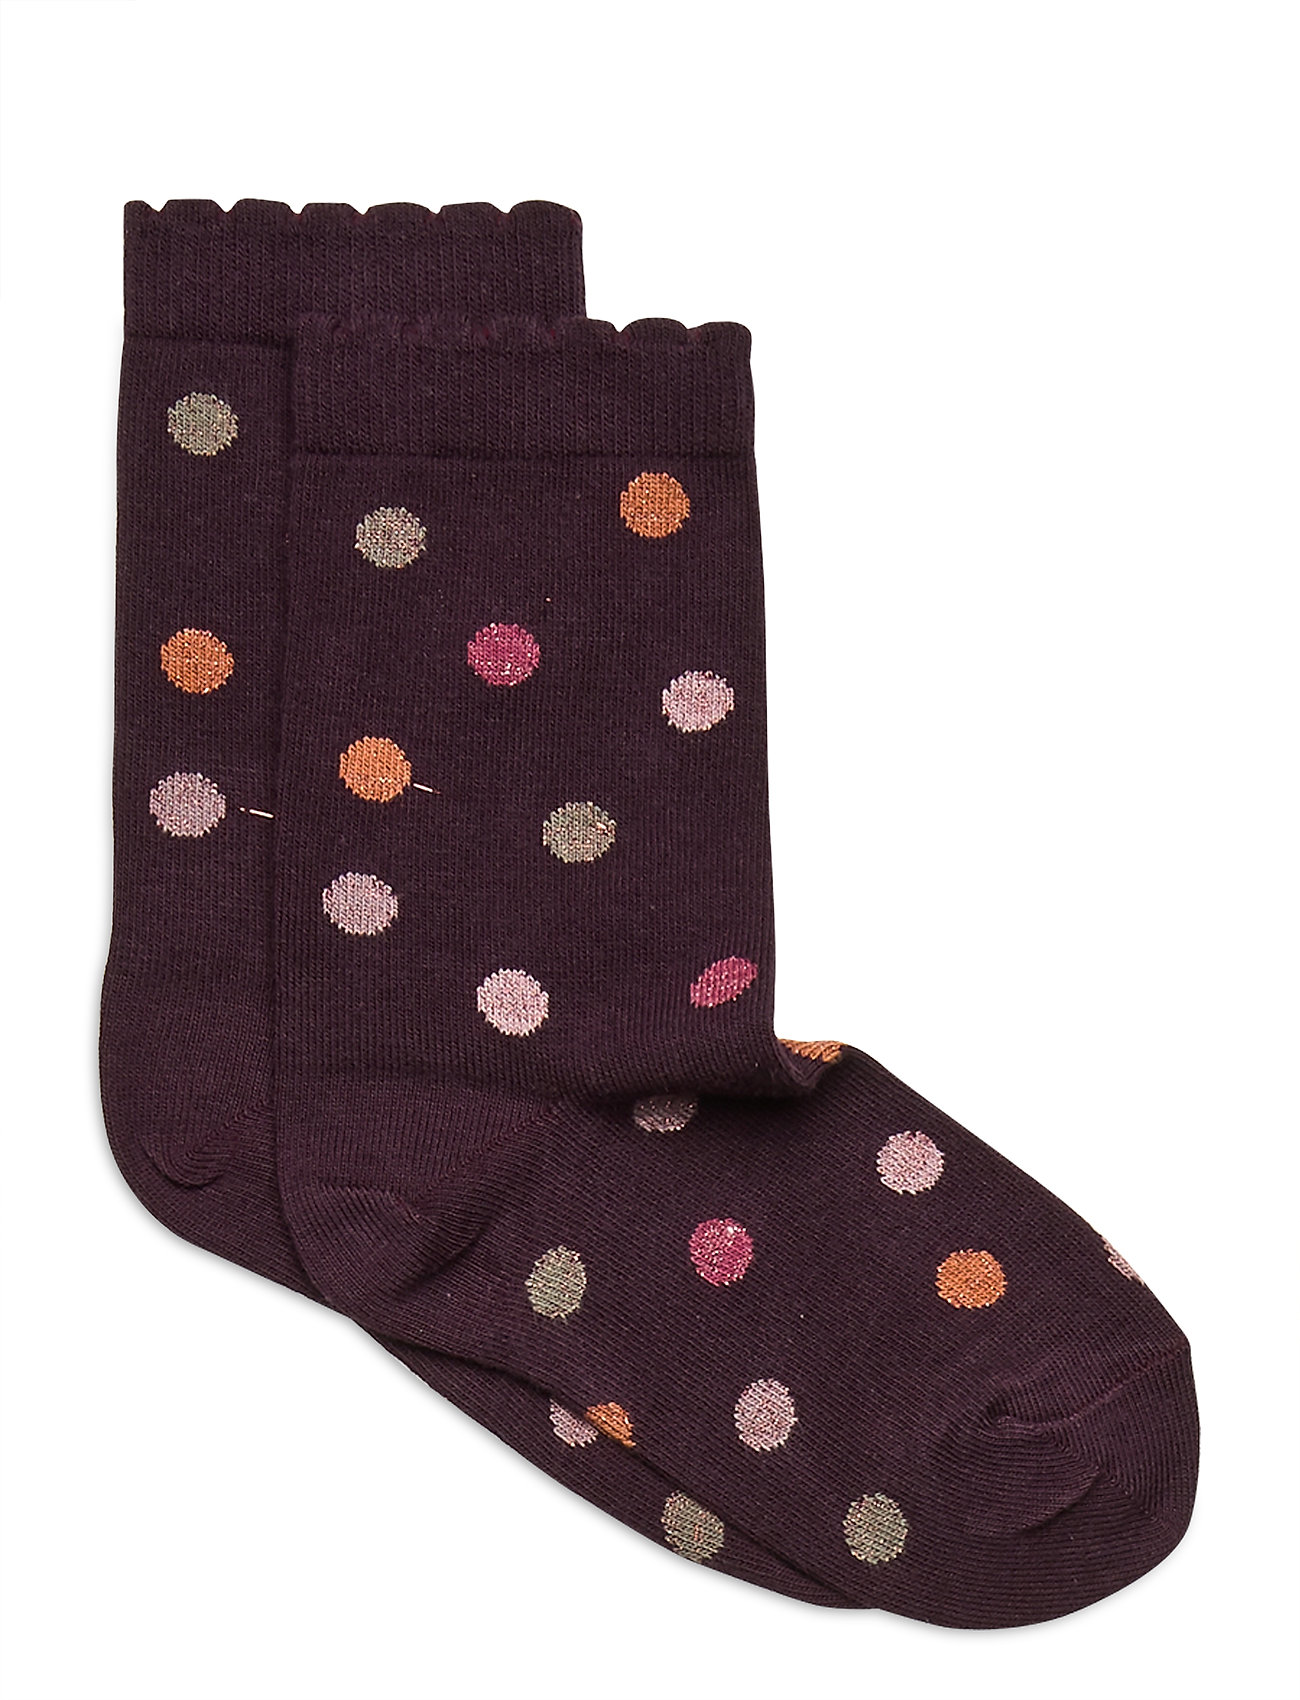 Image of Ankle Sock - Glitter Dots Sokker Strømper Multi/mønstret Melton (3455973819)